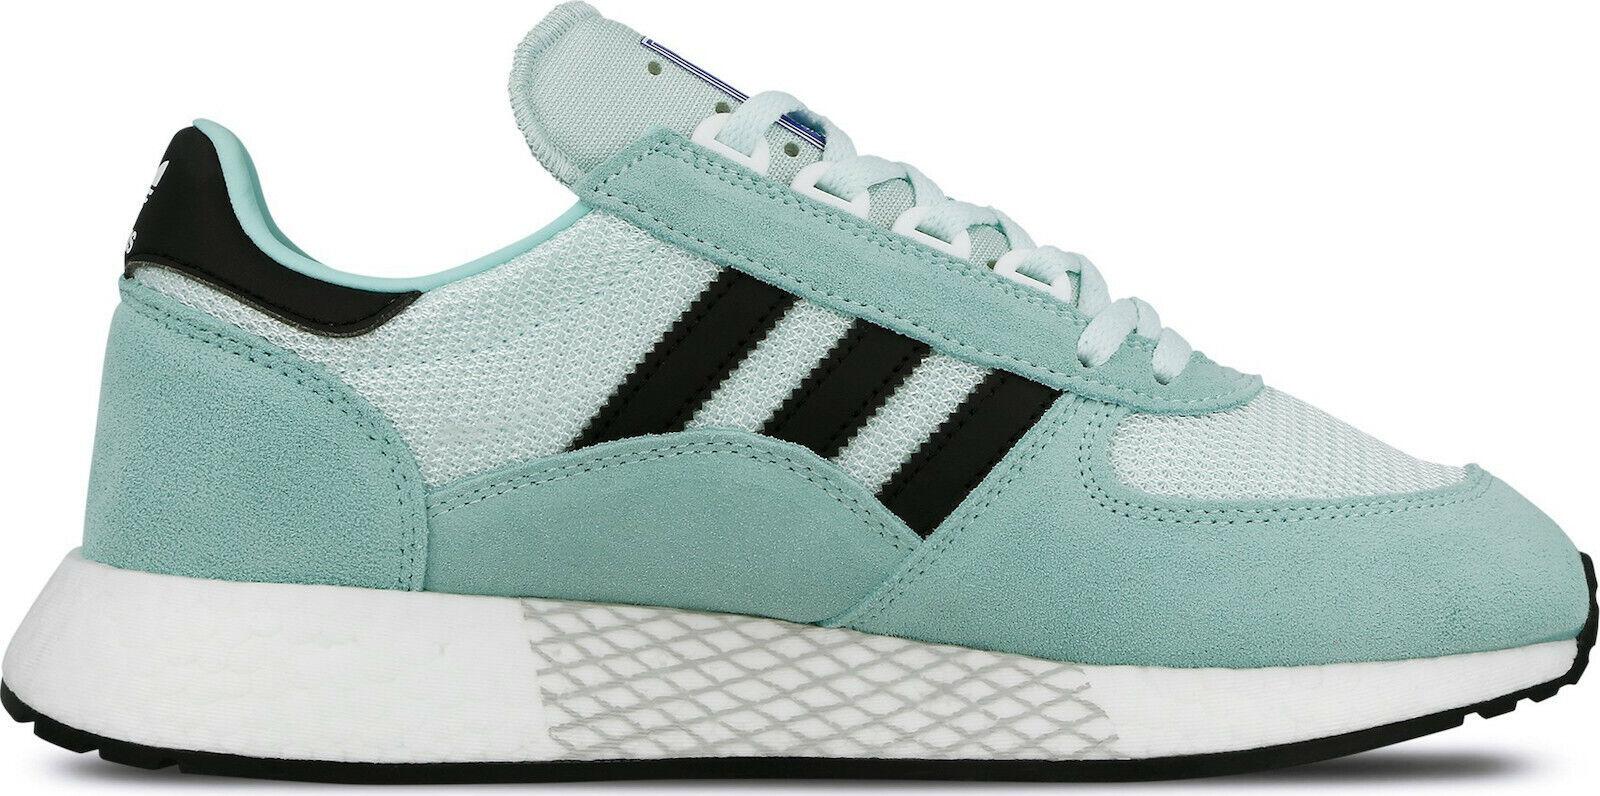 Adidas Marathon Tech Boost Größes 10, 12 Mint   Brand New G27521 RARE